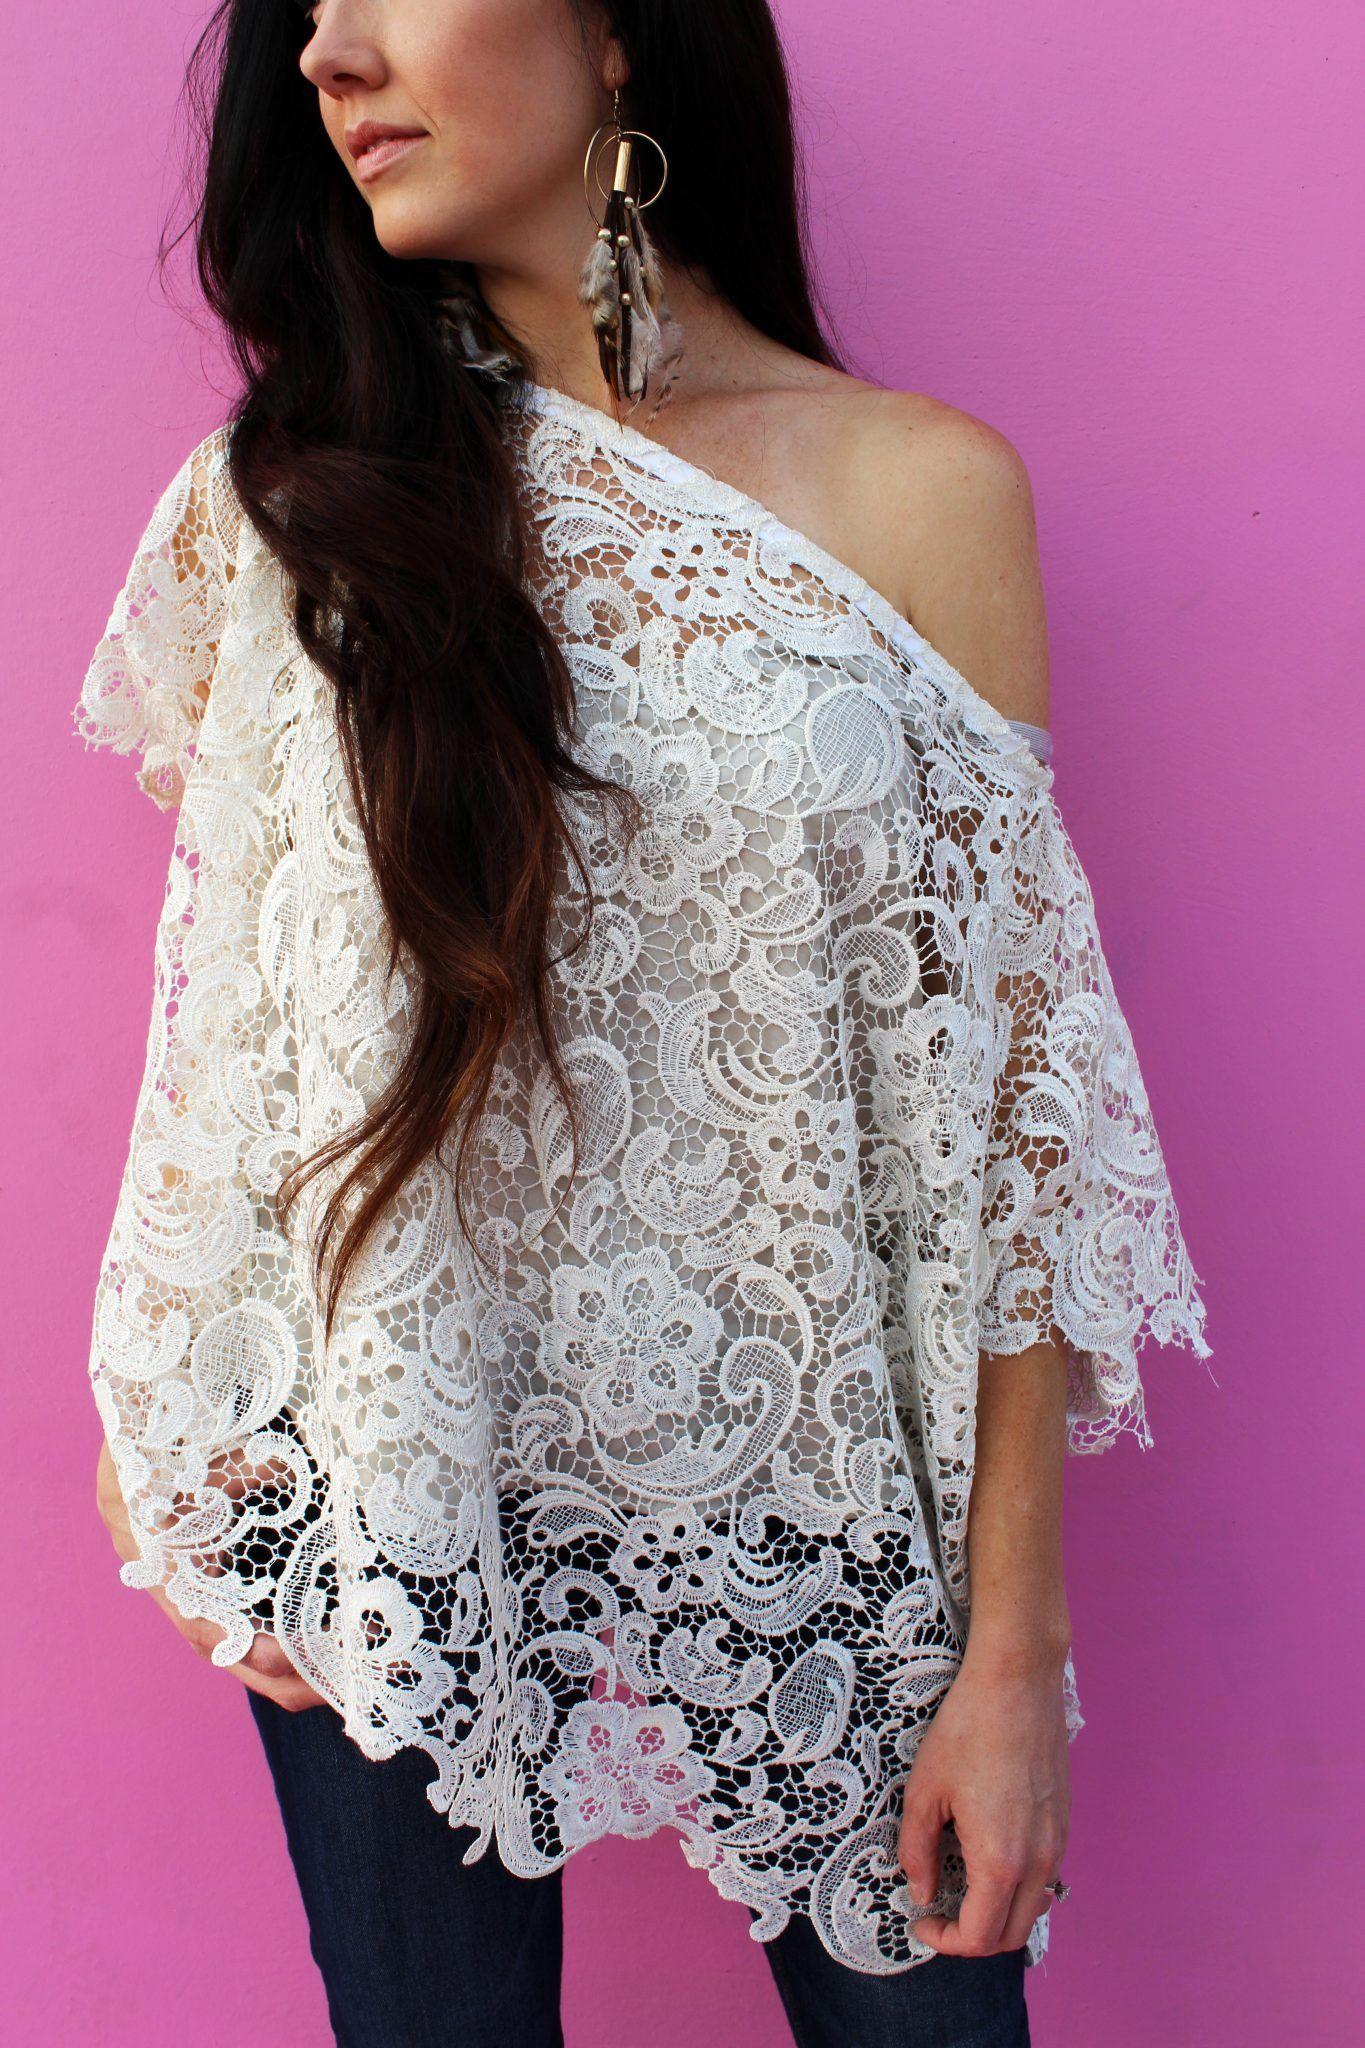 DIY This Easy Boho Off Shoulder Top | Diy lace shirt, Diy ...